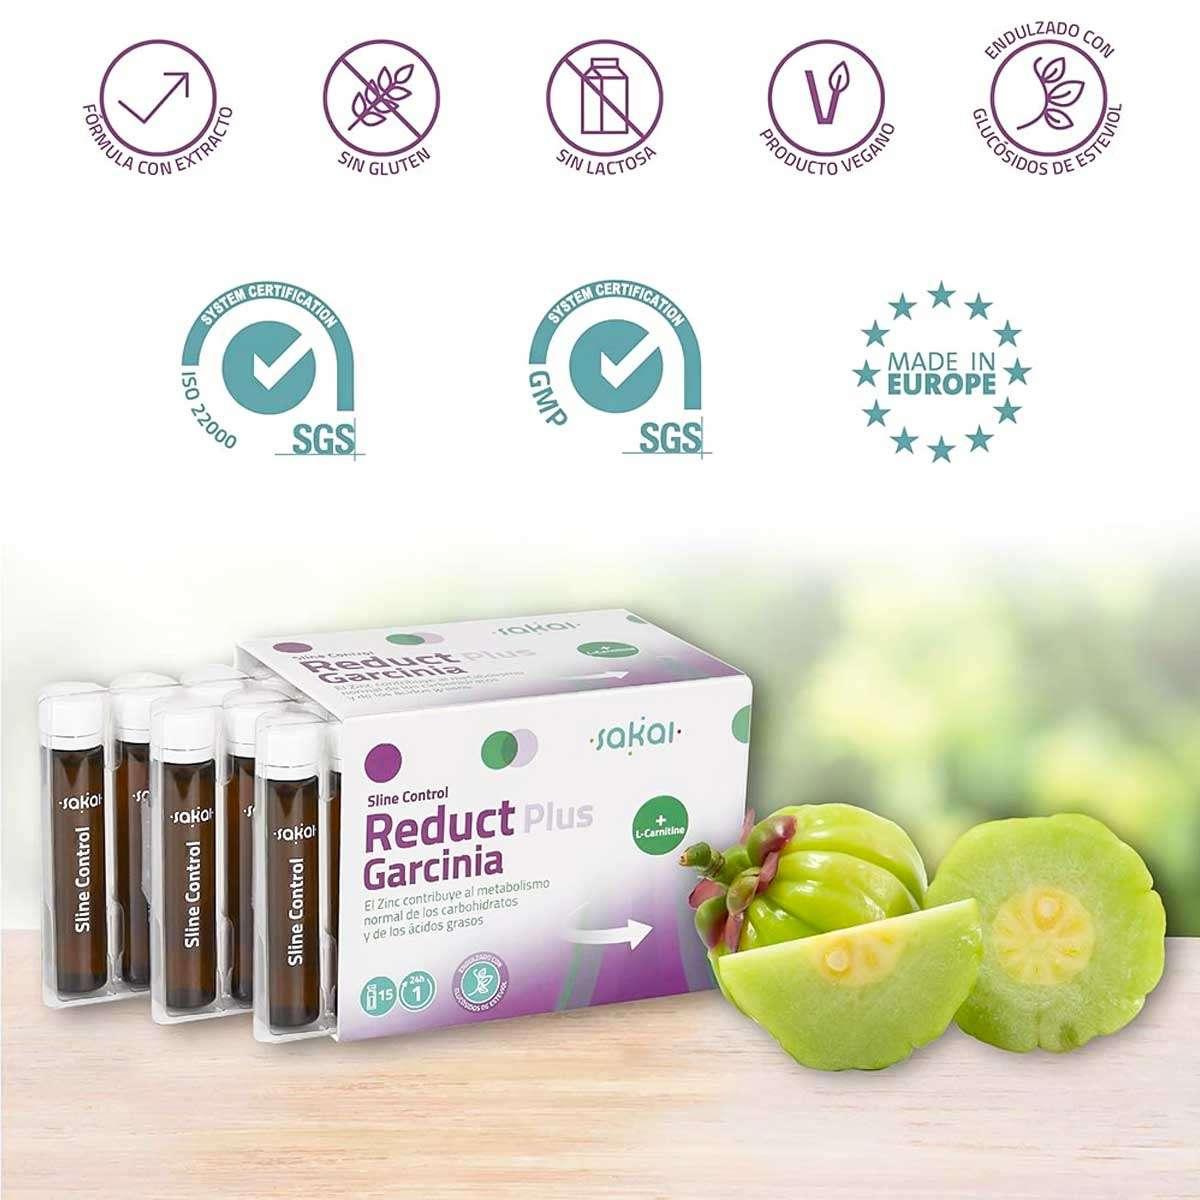 Sline Control Reduct Plus Garcinia Sakai 15 viales